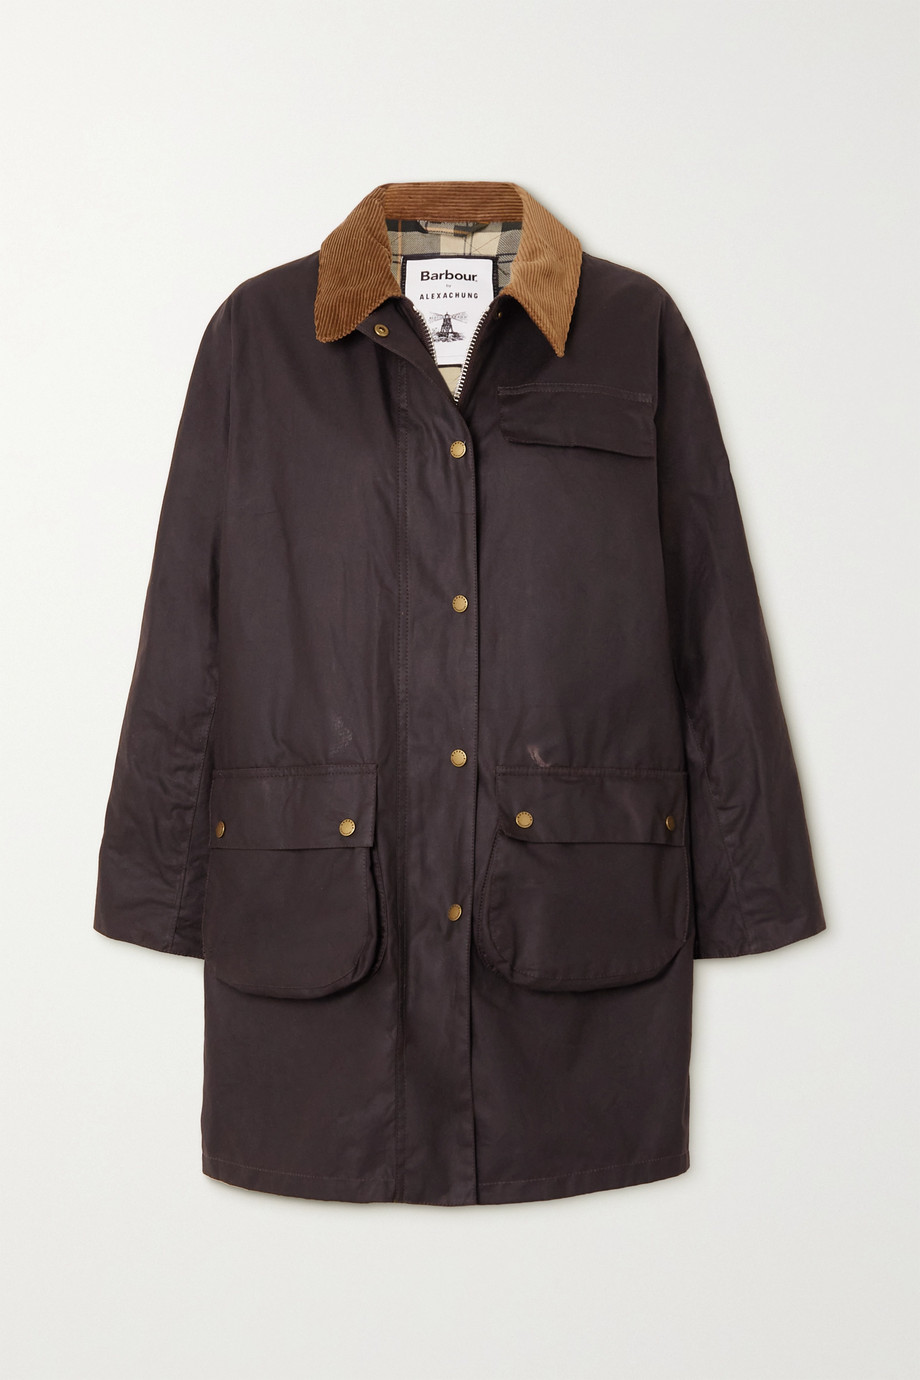 Barbour + ALEXACHUNG Rowan corduroy-trimmed waxed-cotton jacket